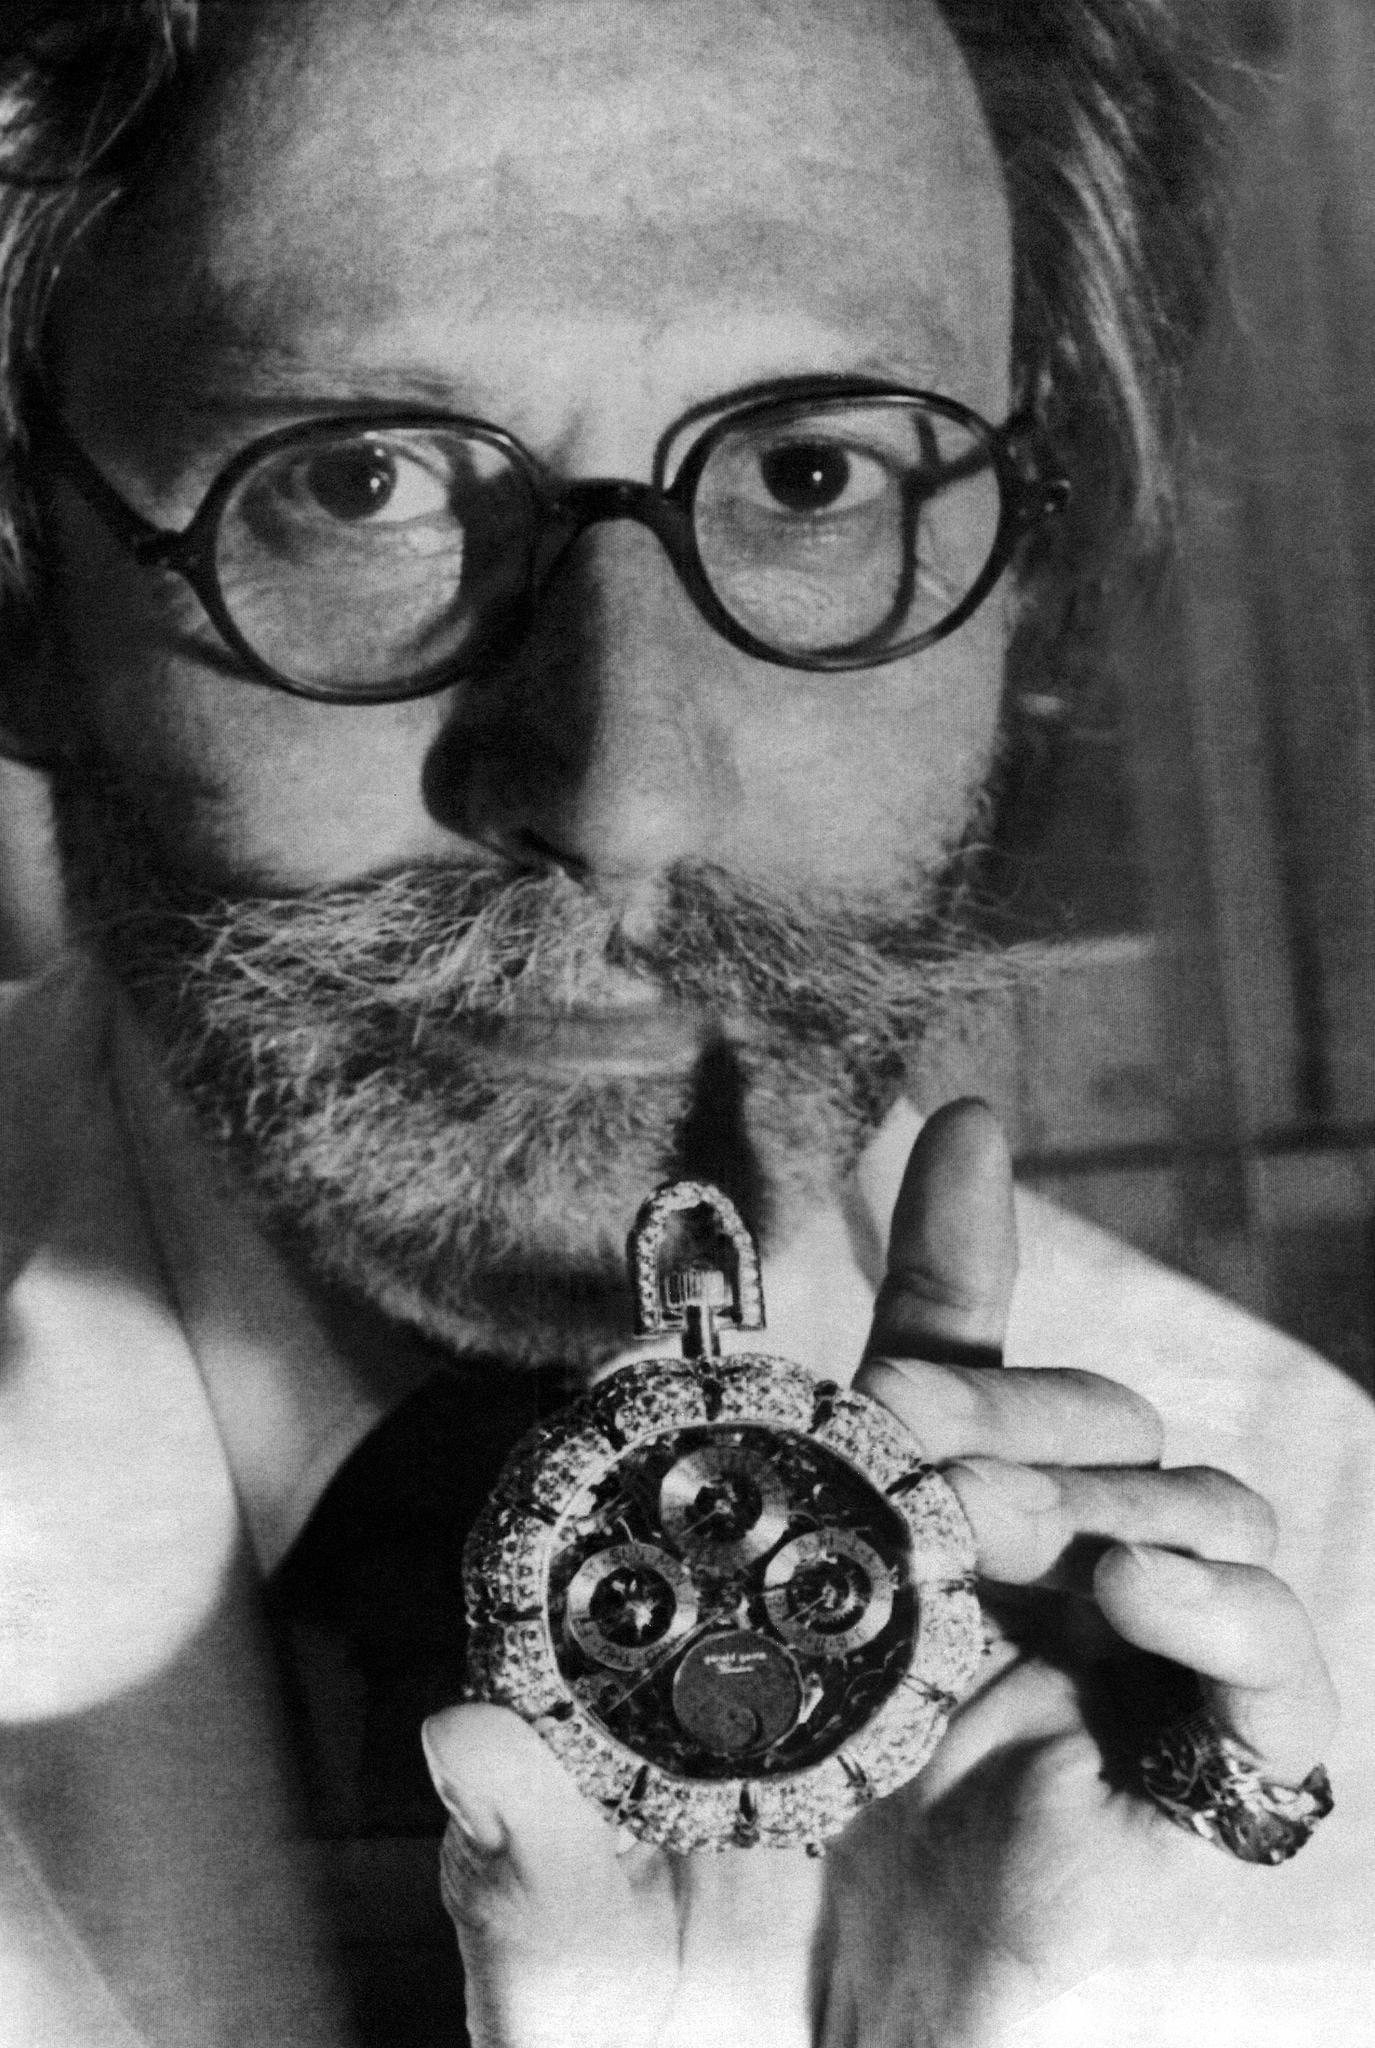 Gerald Genta presents a watch in gold and 30 carat diamonds in Geneva, Switzerland on September 25, 1979.